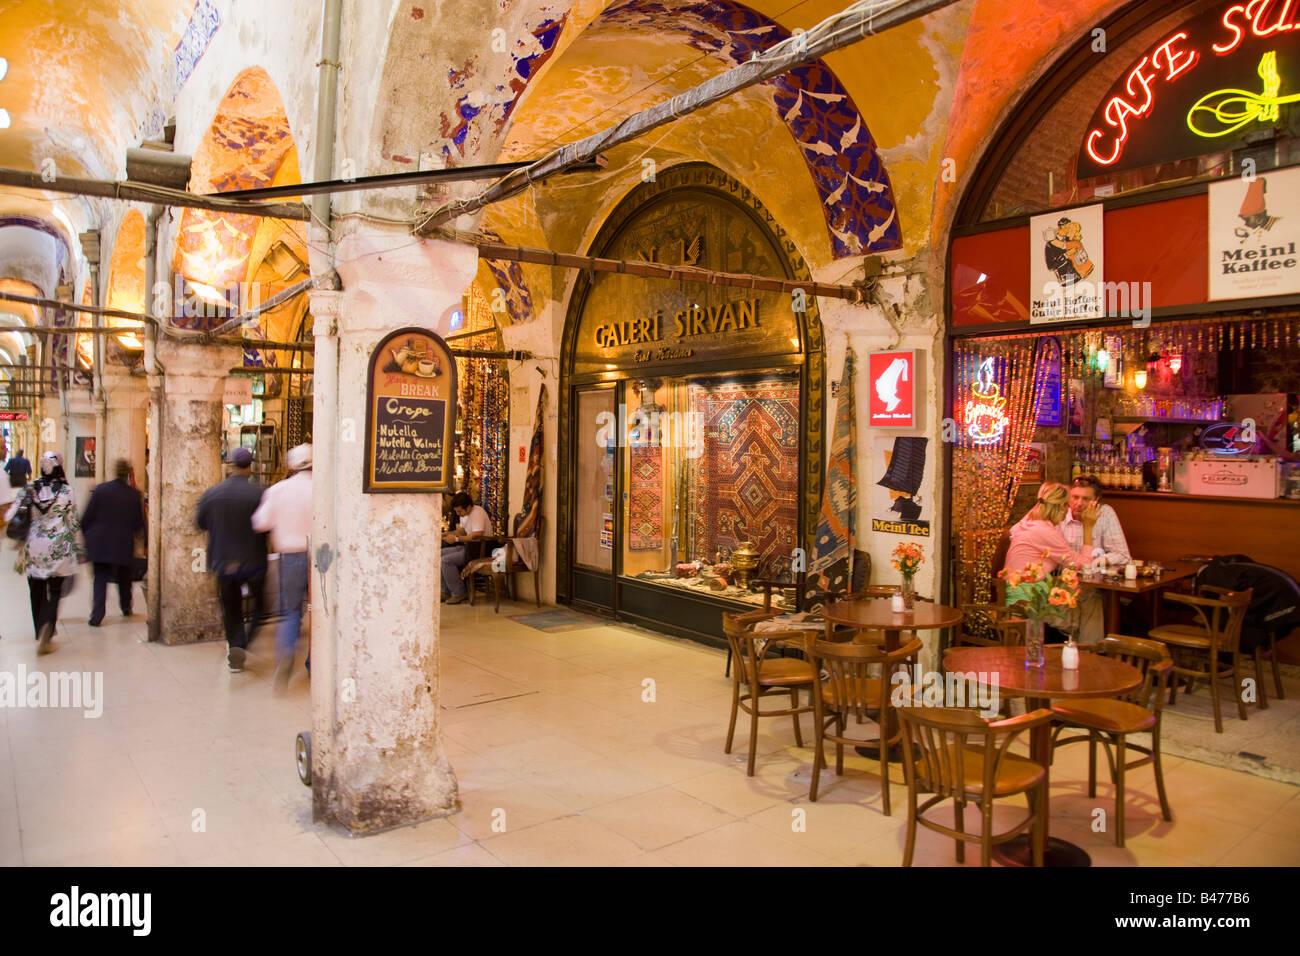 Turkey Istanbul Spice Market in the Egyptian Bazaar - Stock Image